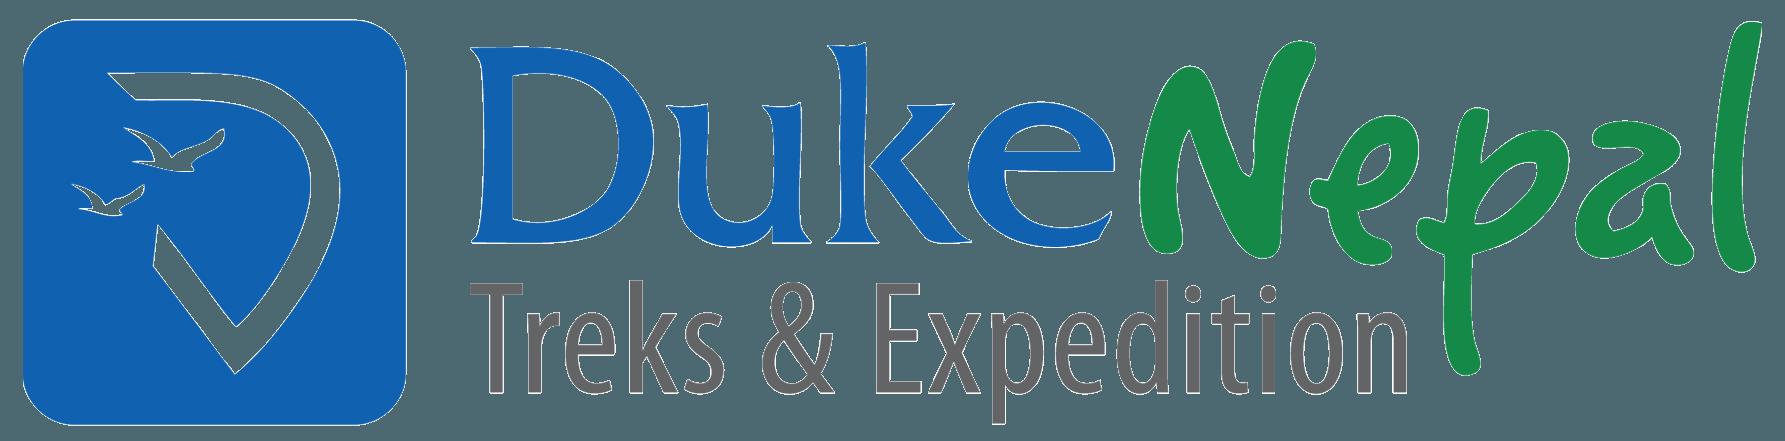 Trekking in Nepal | Hiking | Expedition | Duke Nepal Treks and Expedition